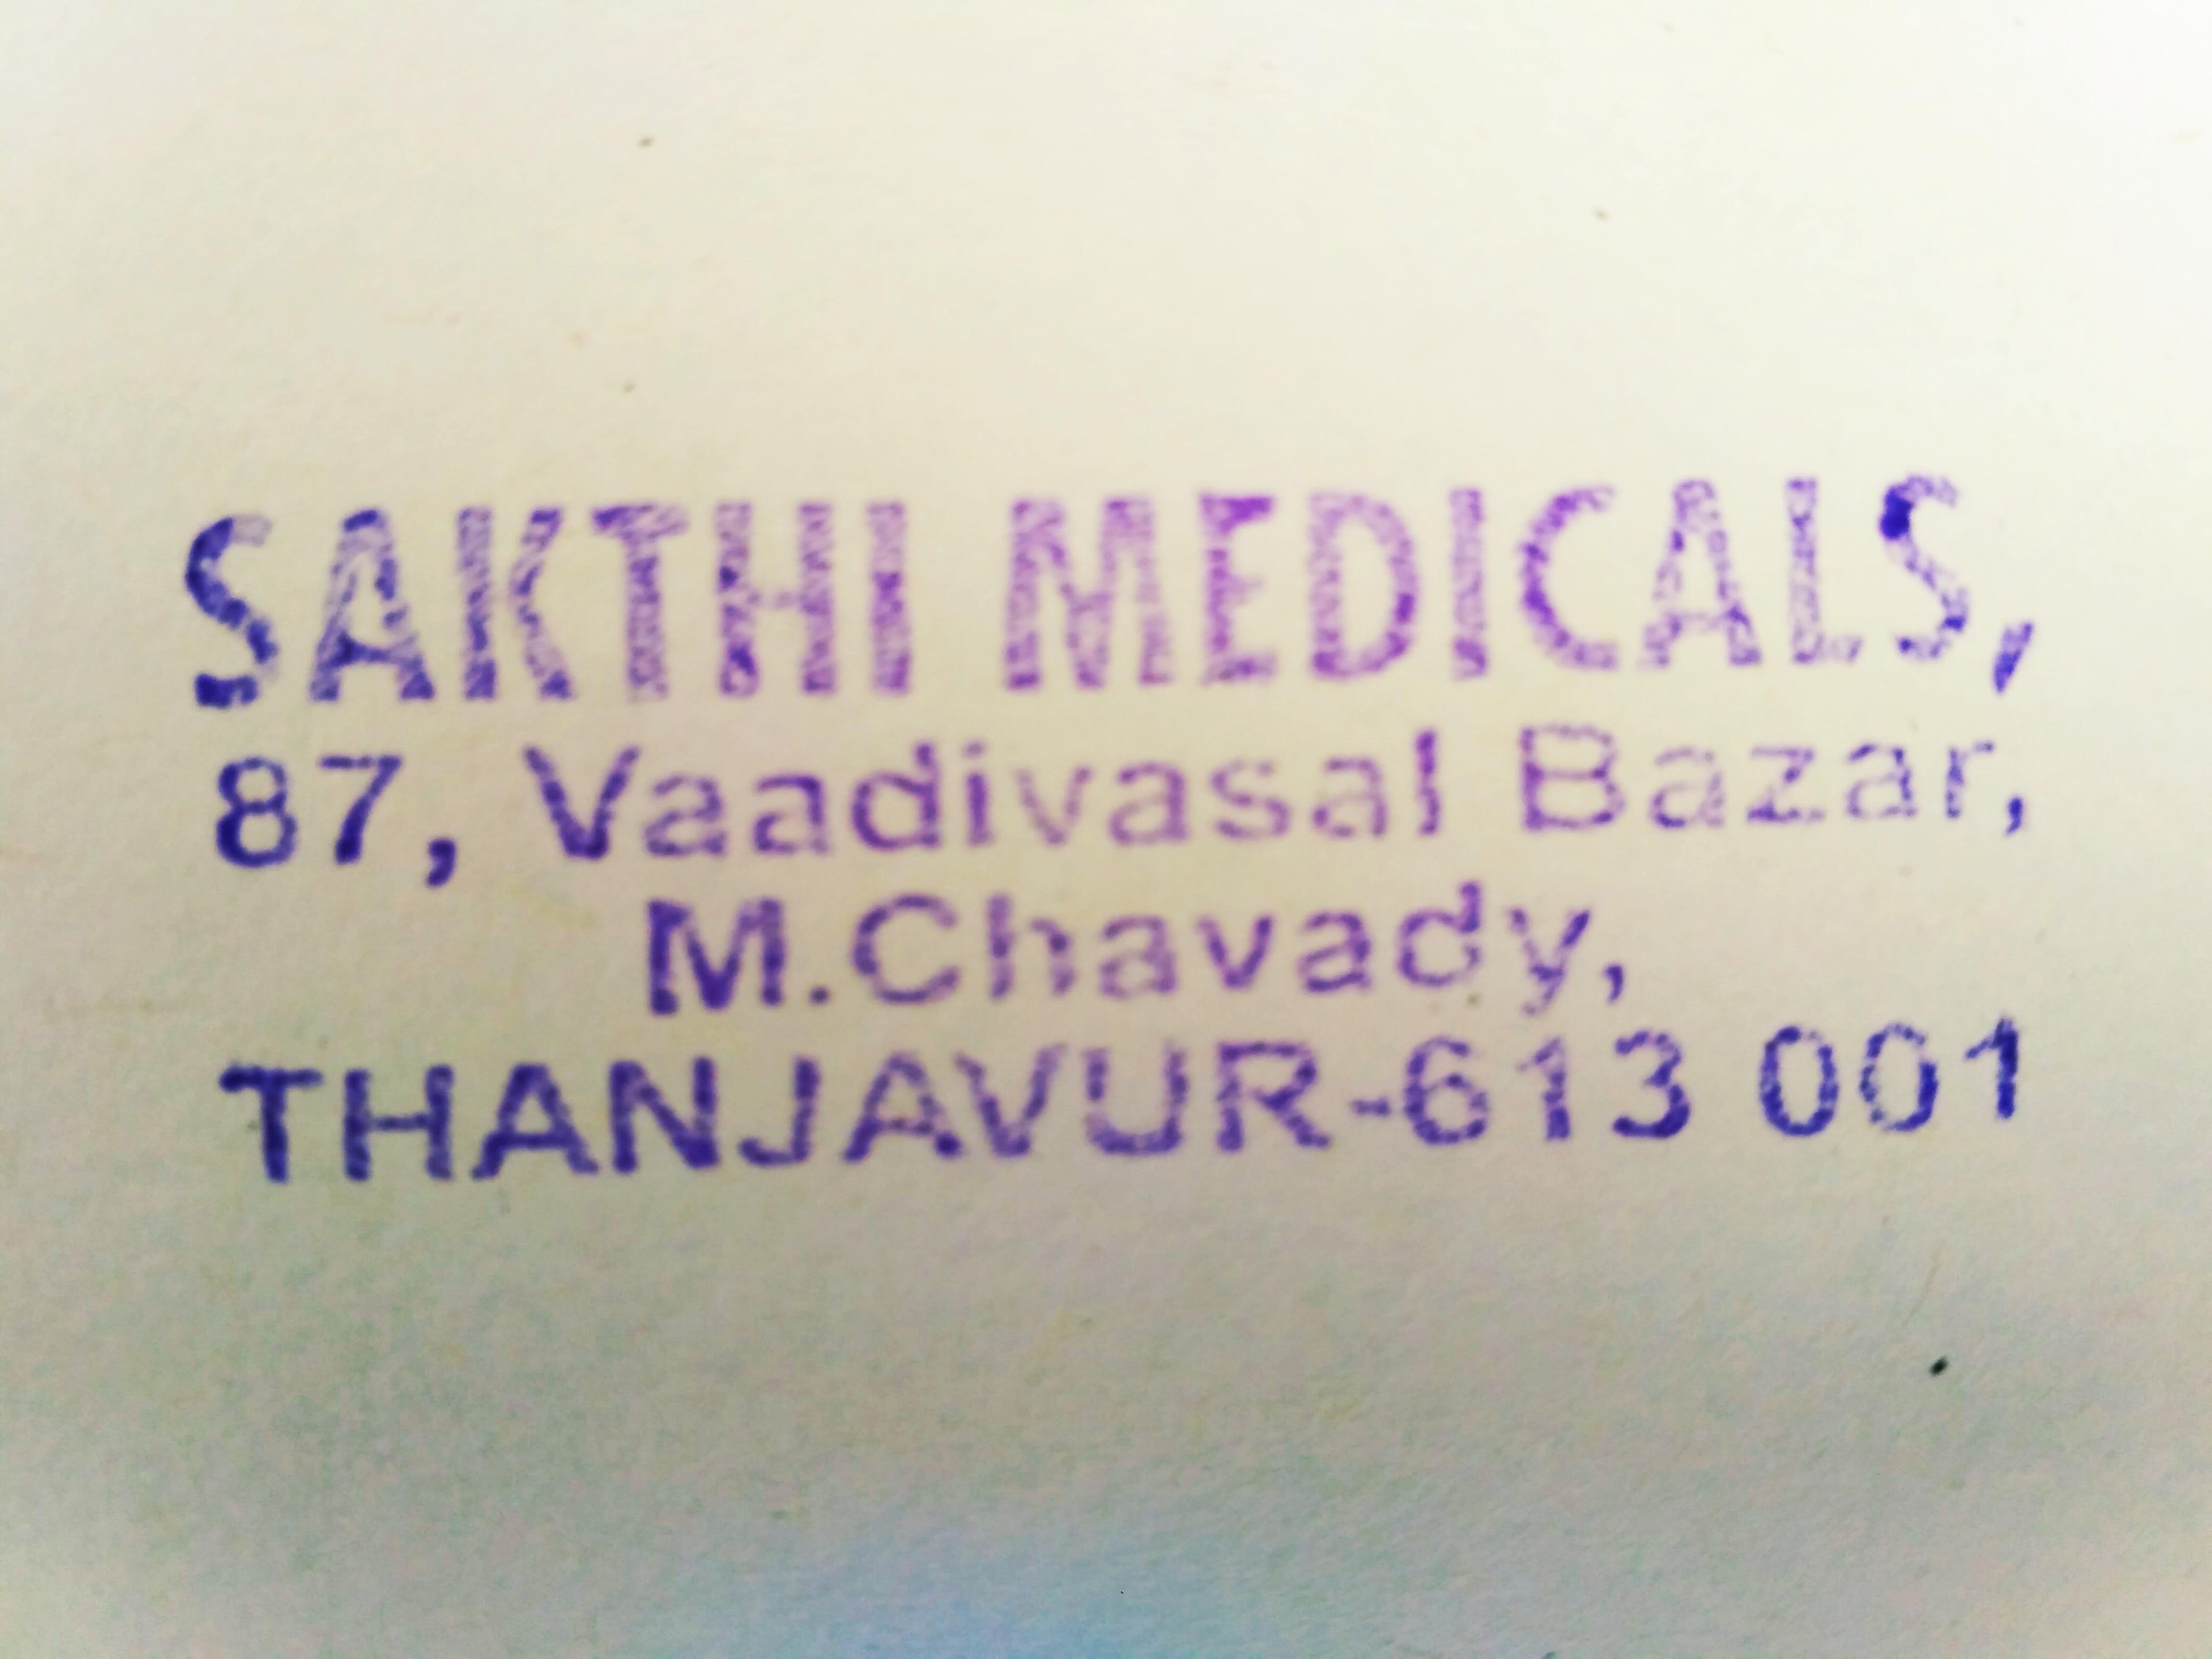 Sakthi Medicals